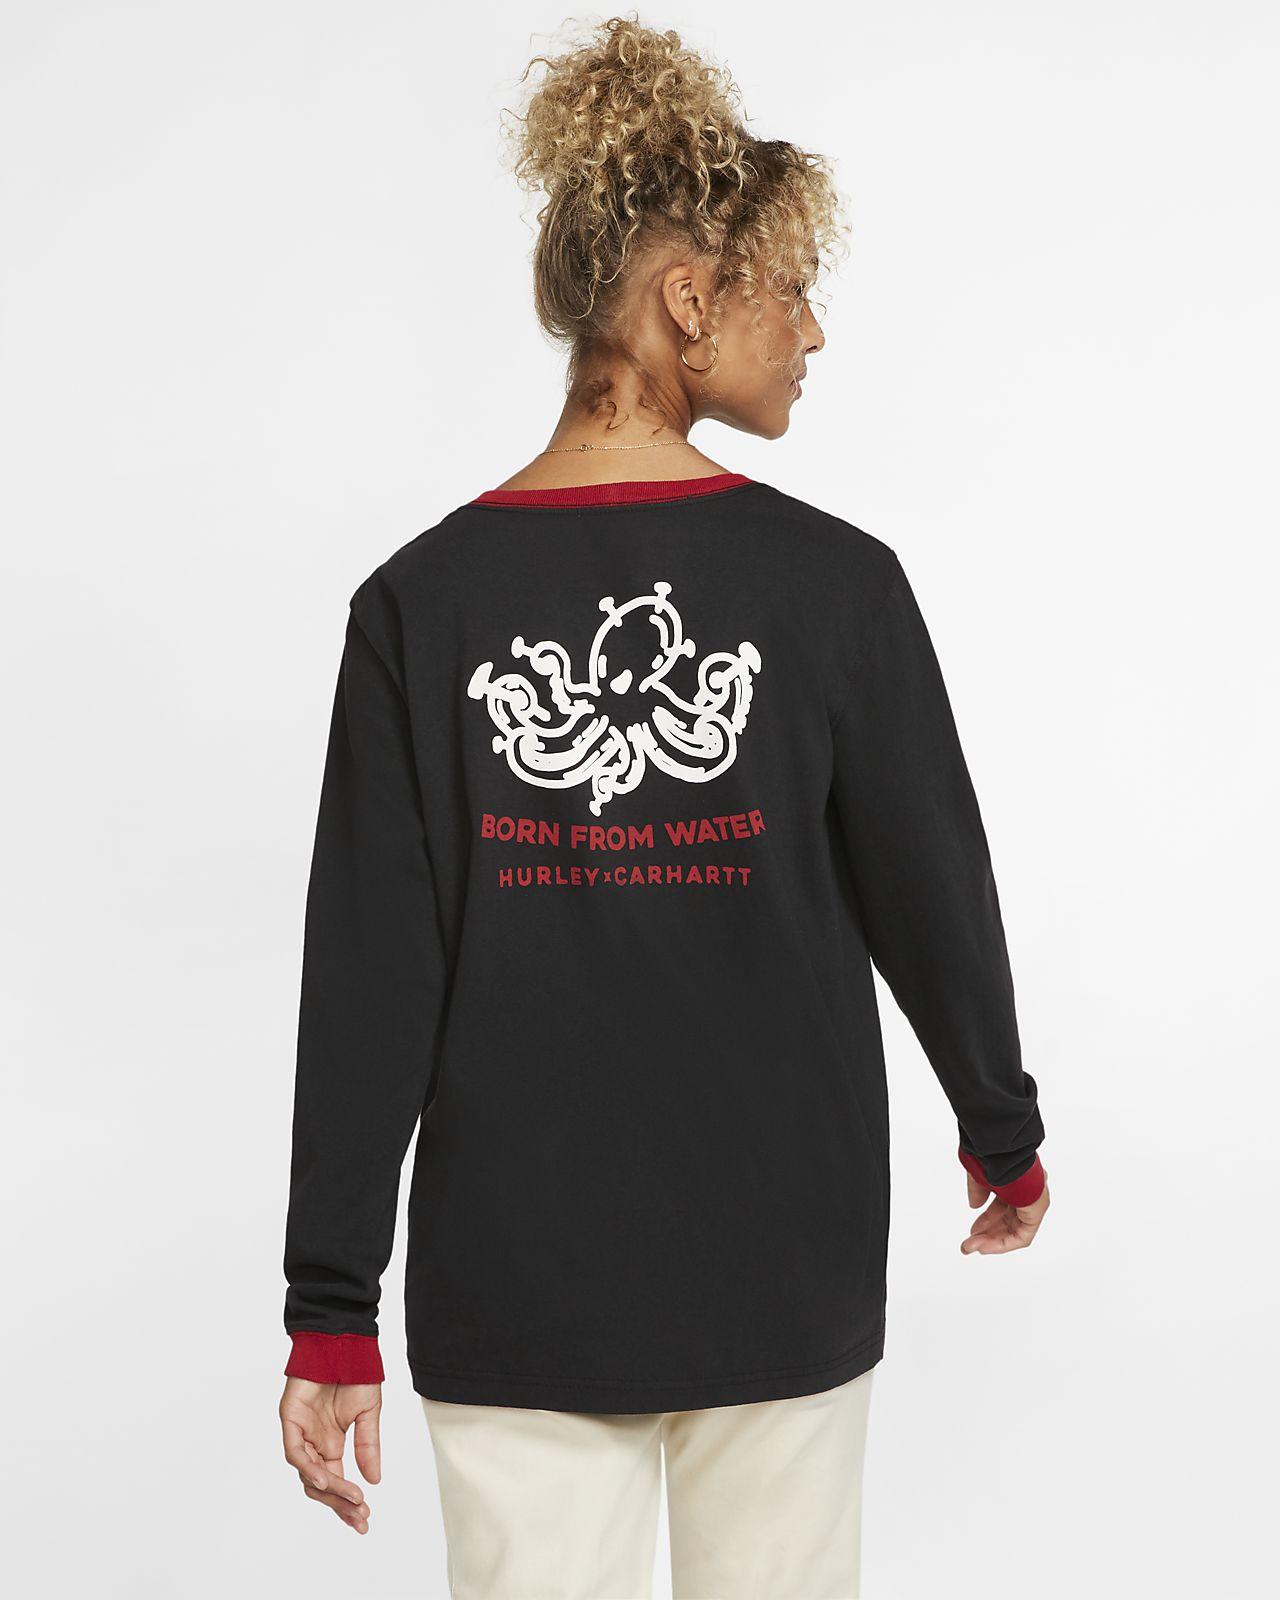 Hurley x Carhartt Outwork Ringer Women's Long-Sleeve T-Shirt